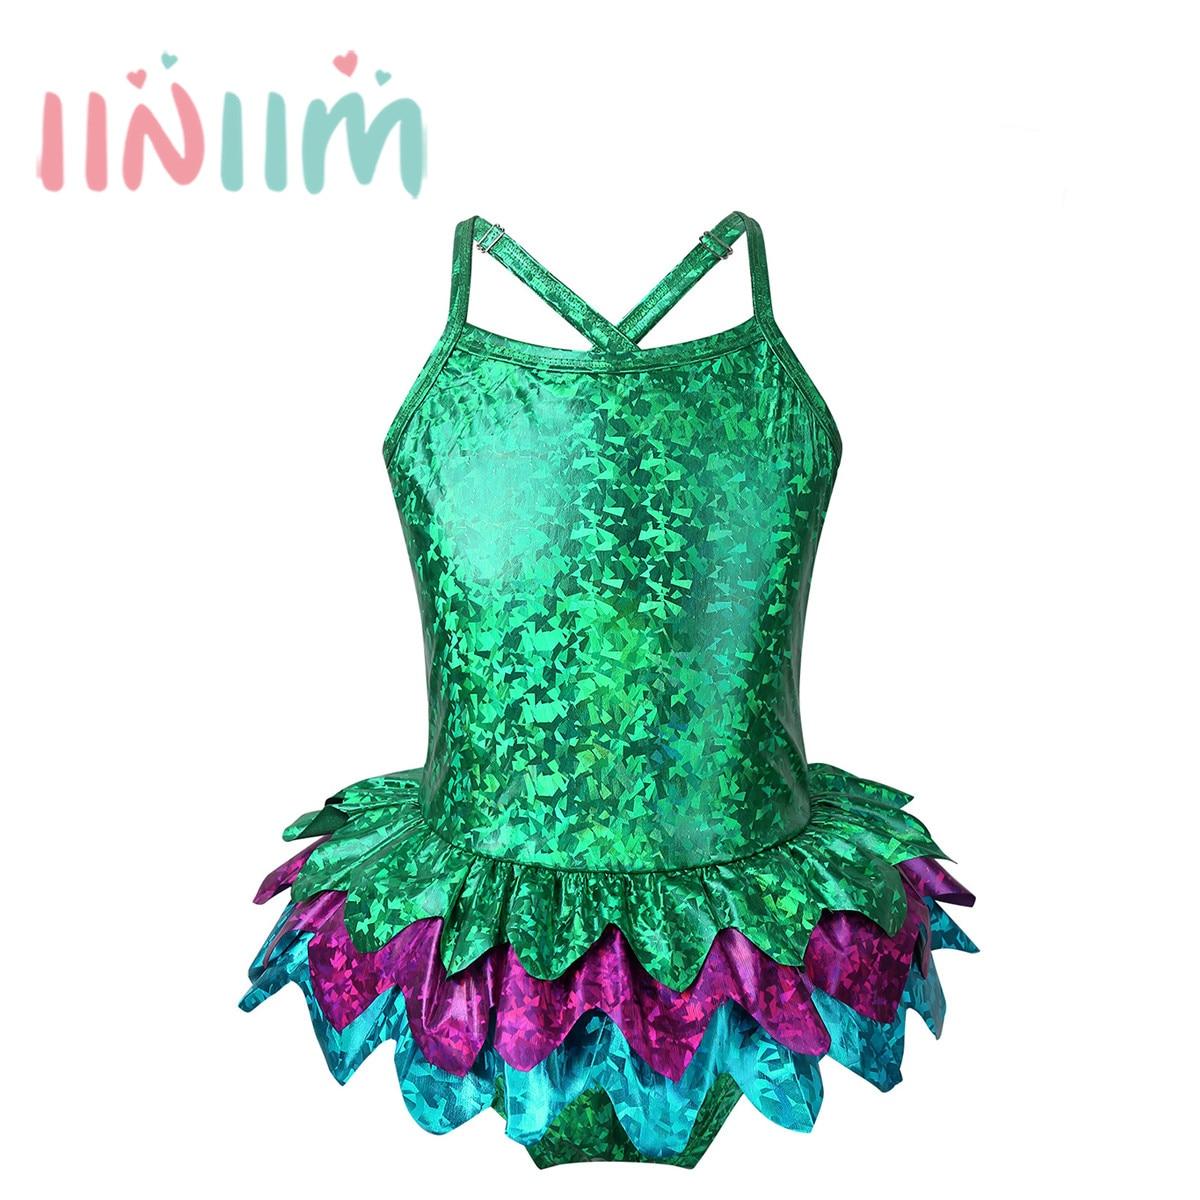 iiniim Kids Girls One Shoulder Ruffle Swimsuit Tankini Swimwear Bathing Suit Top with Skirted Bottoms